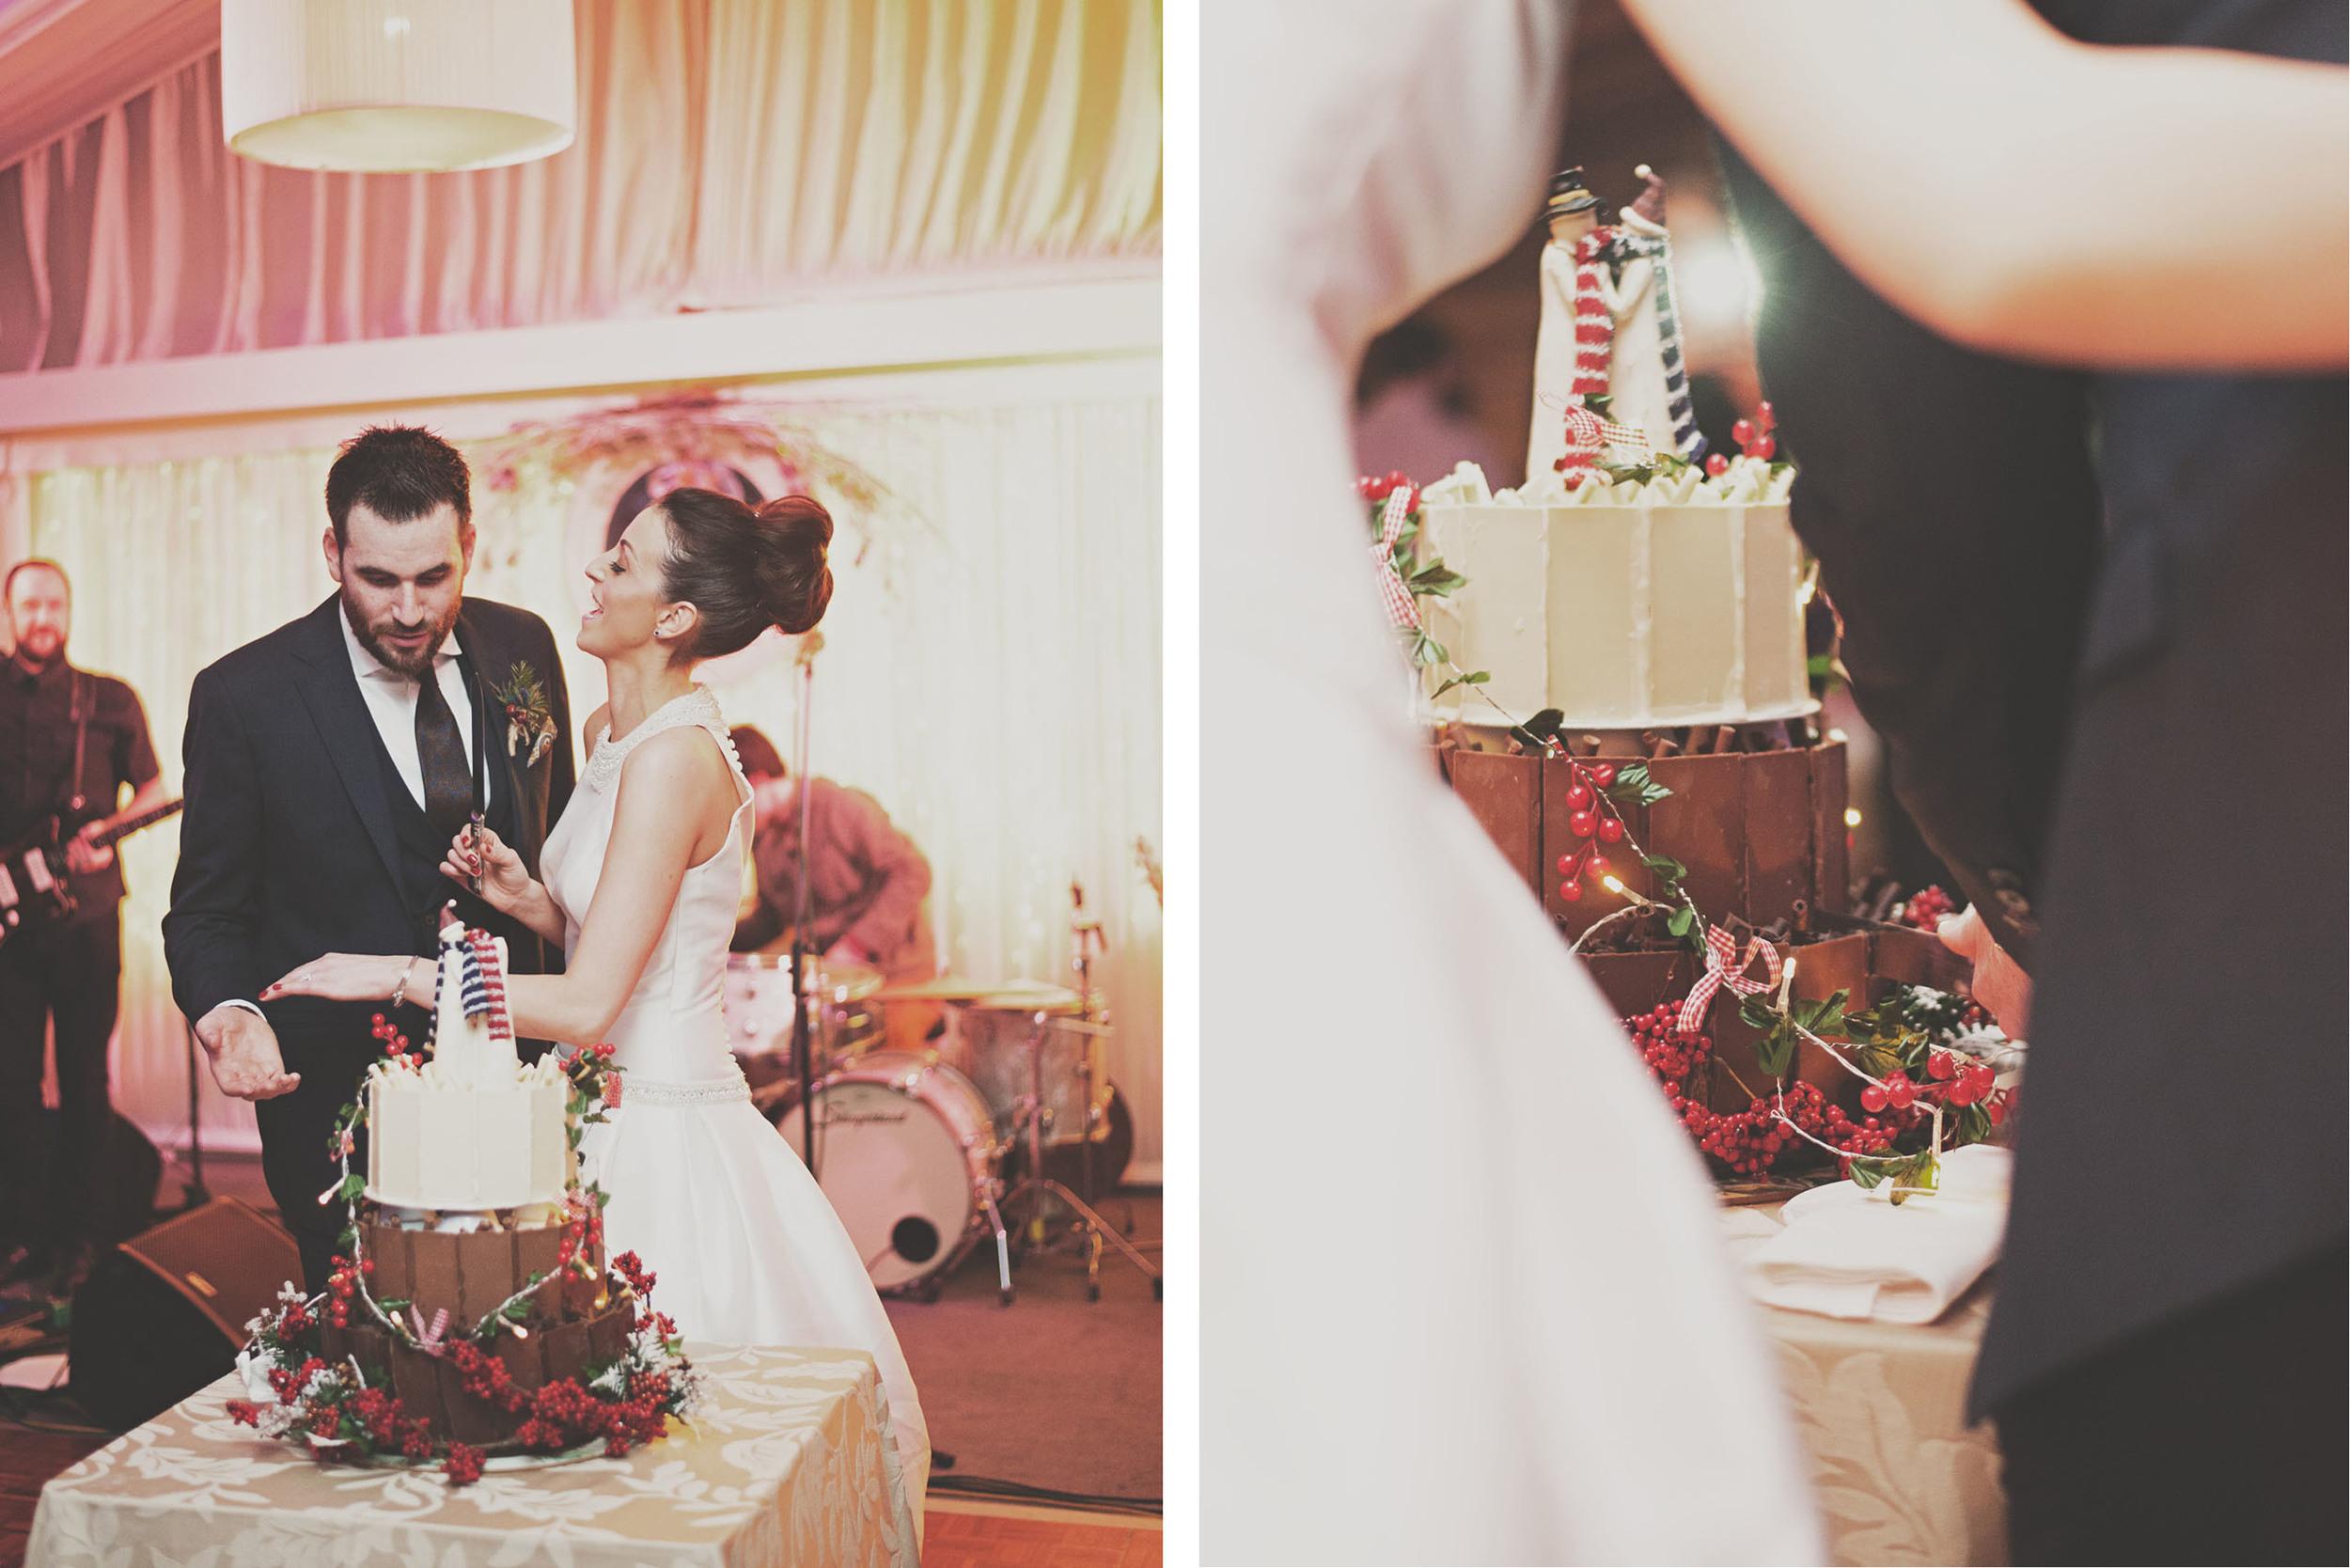 Tricia & Maurice's Coolbawn Quay Wedding 122.jpg